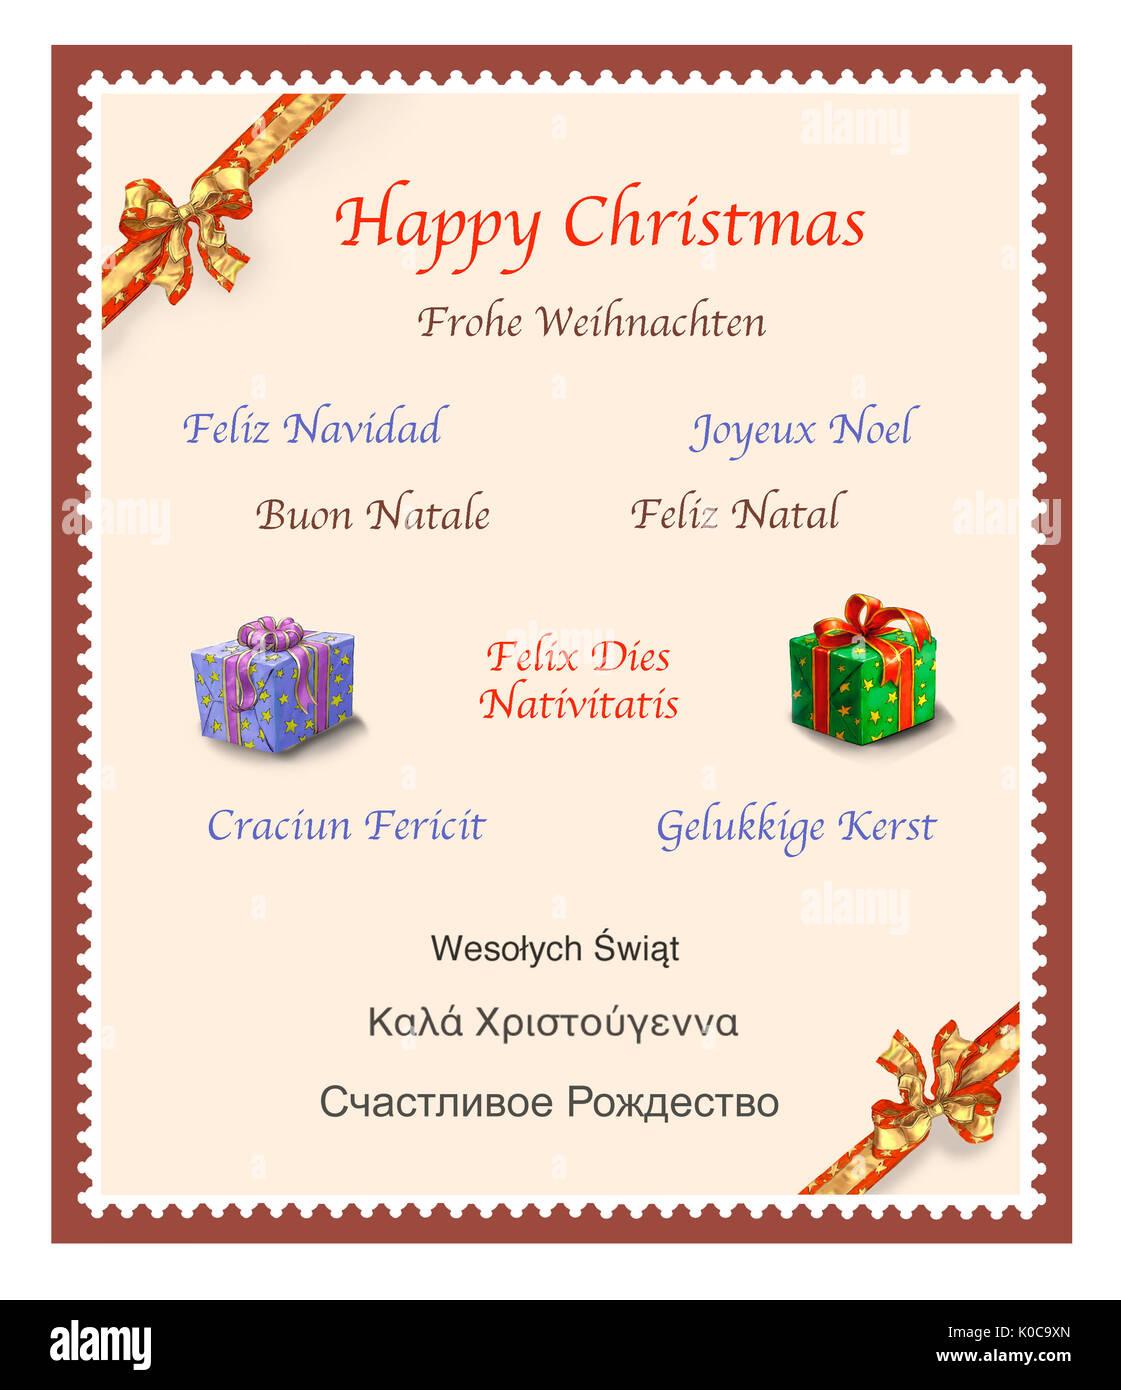 Christmas Card Design, Multilingual, Multi Languages - Stock Image